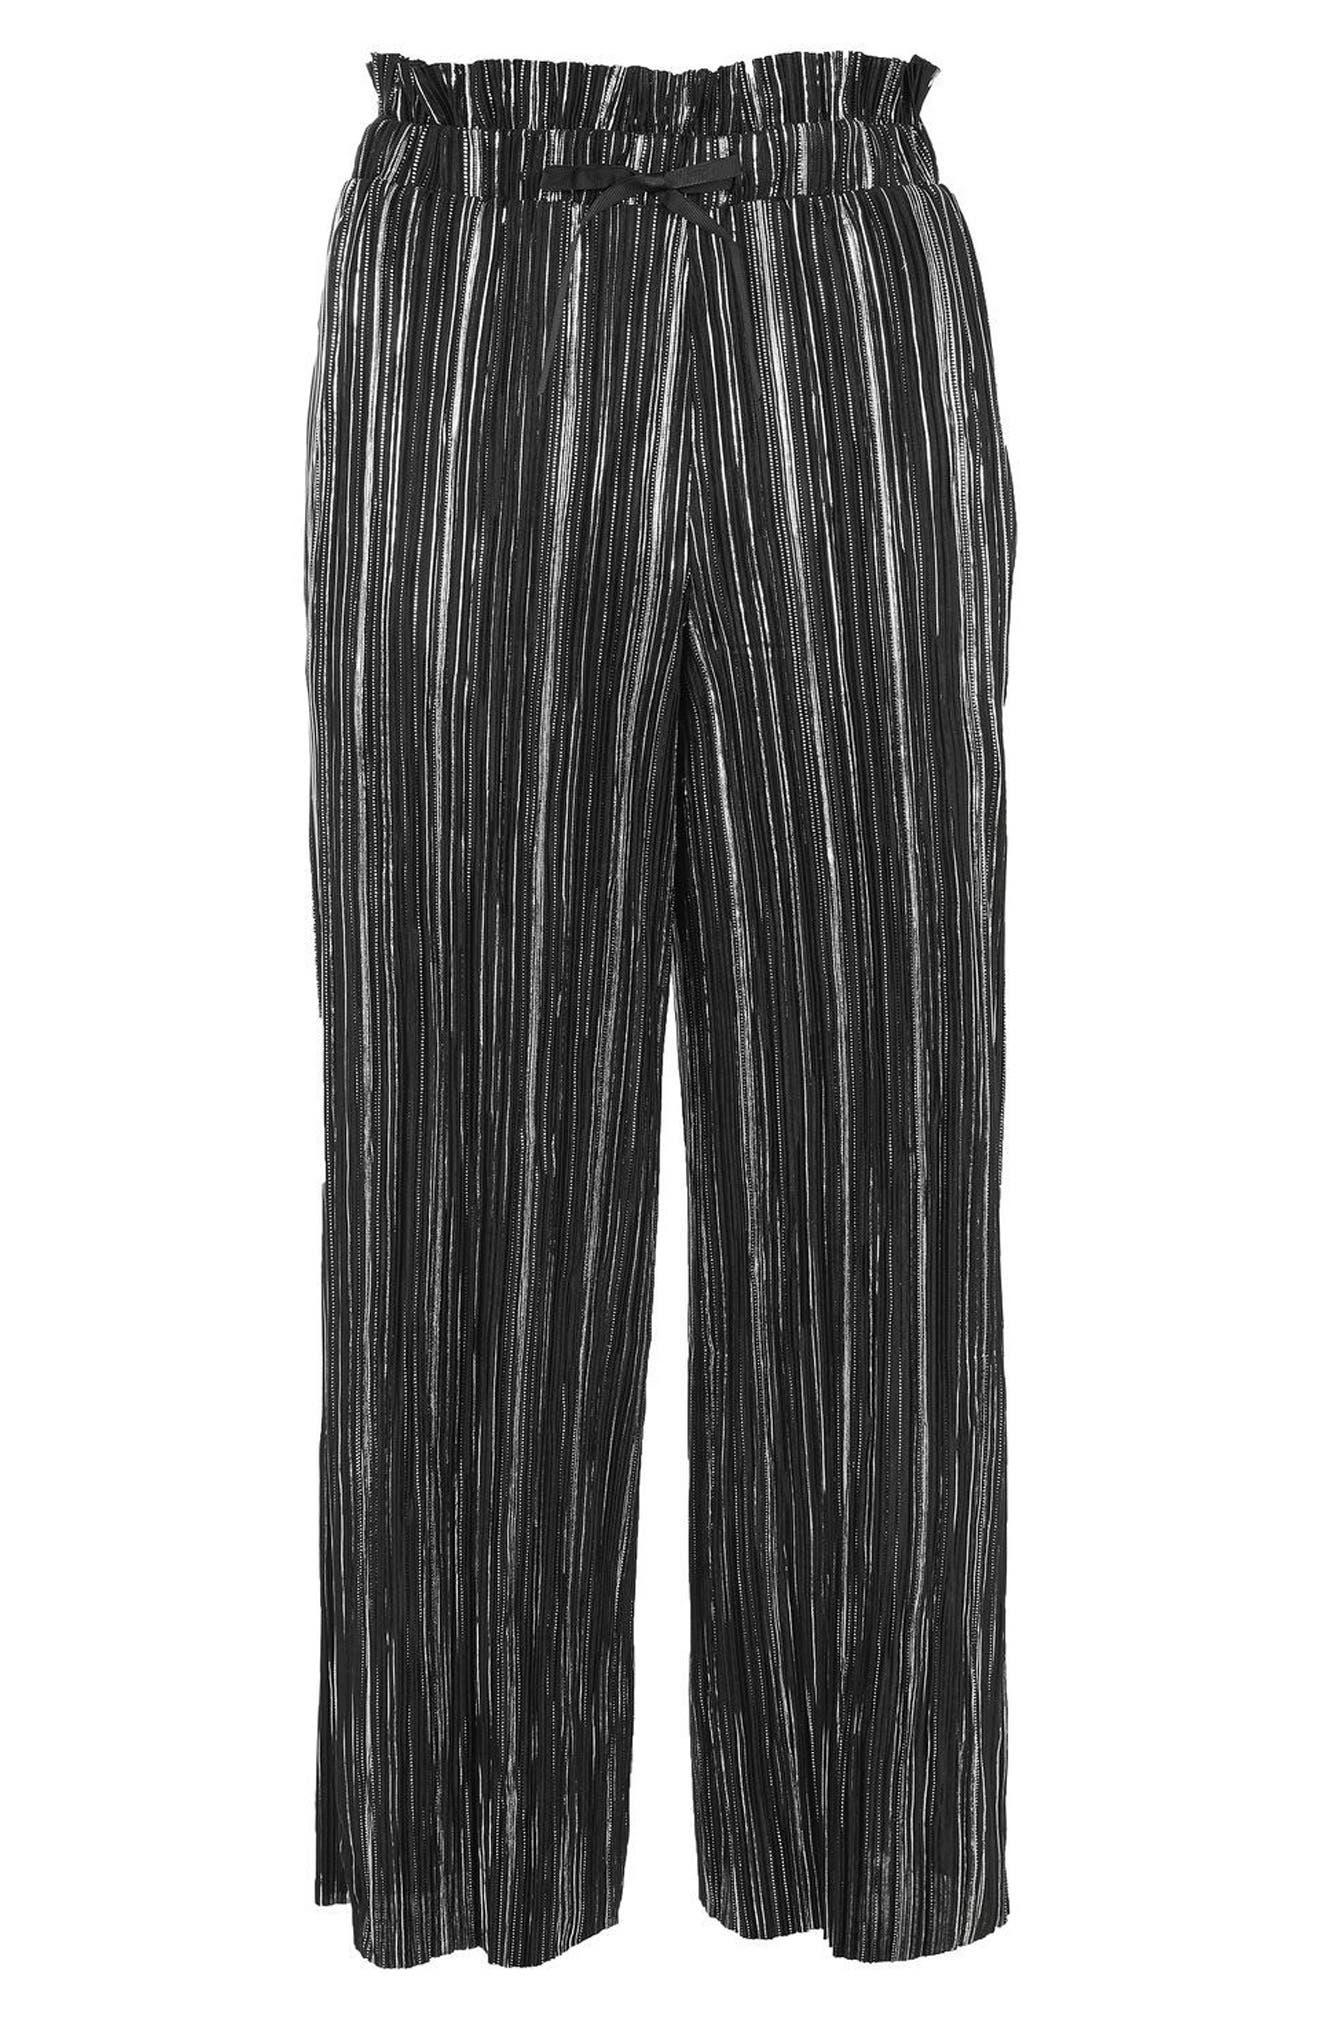 Metallic Plissé Pants,                             Alternate thumbnail 4, color,